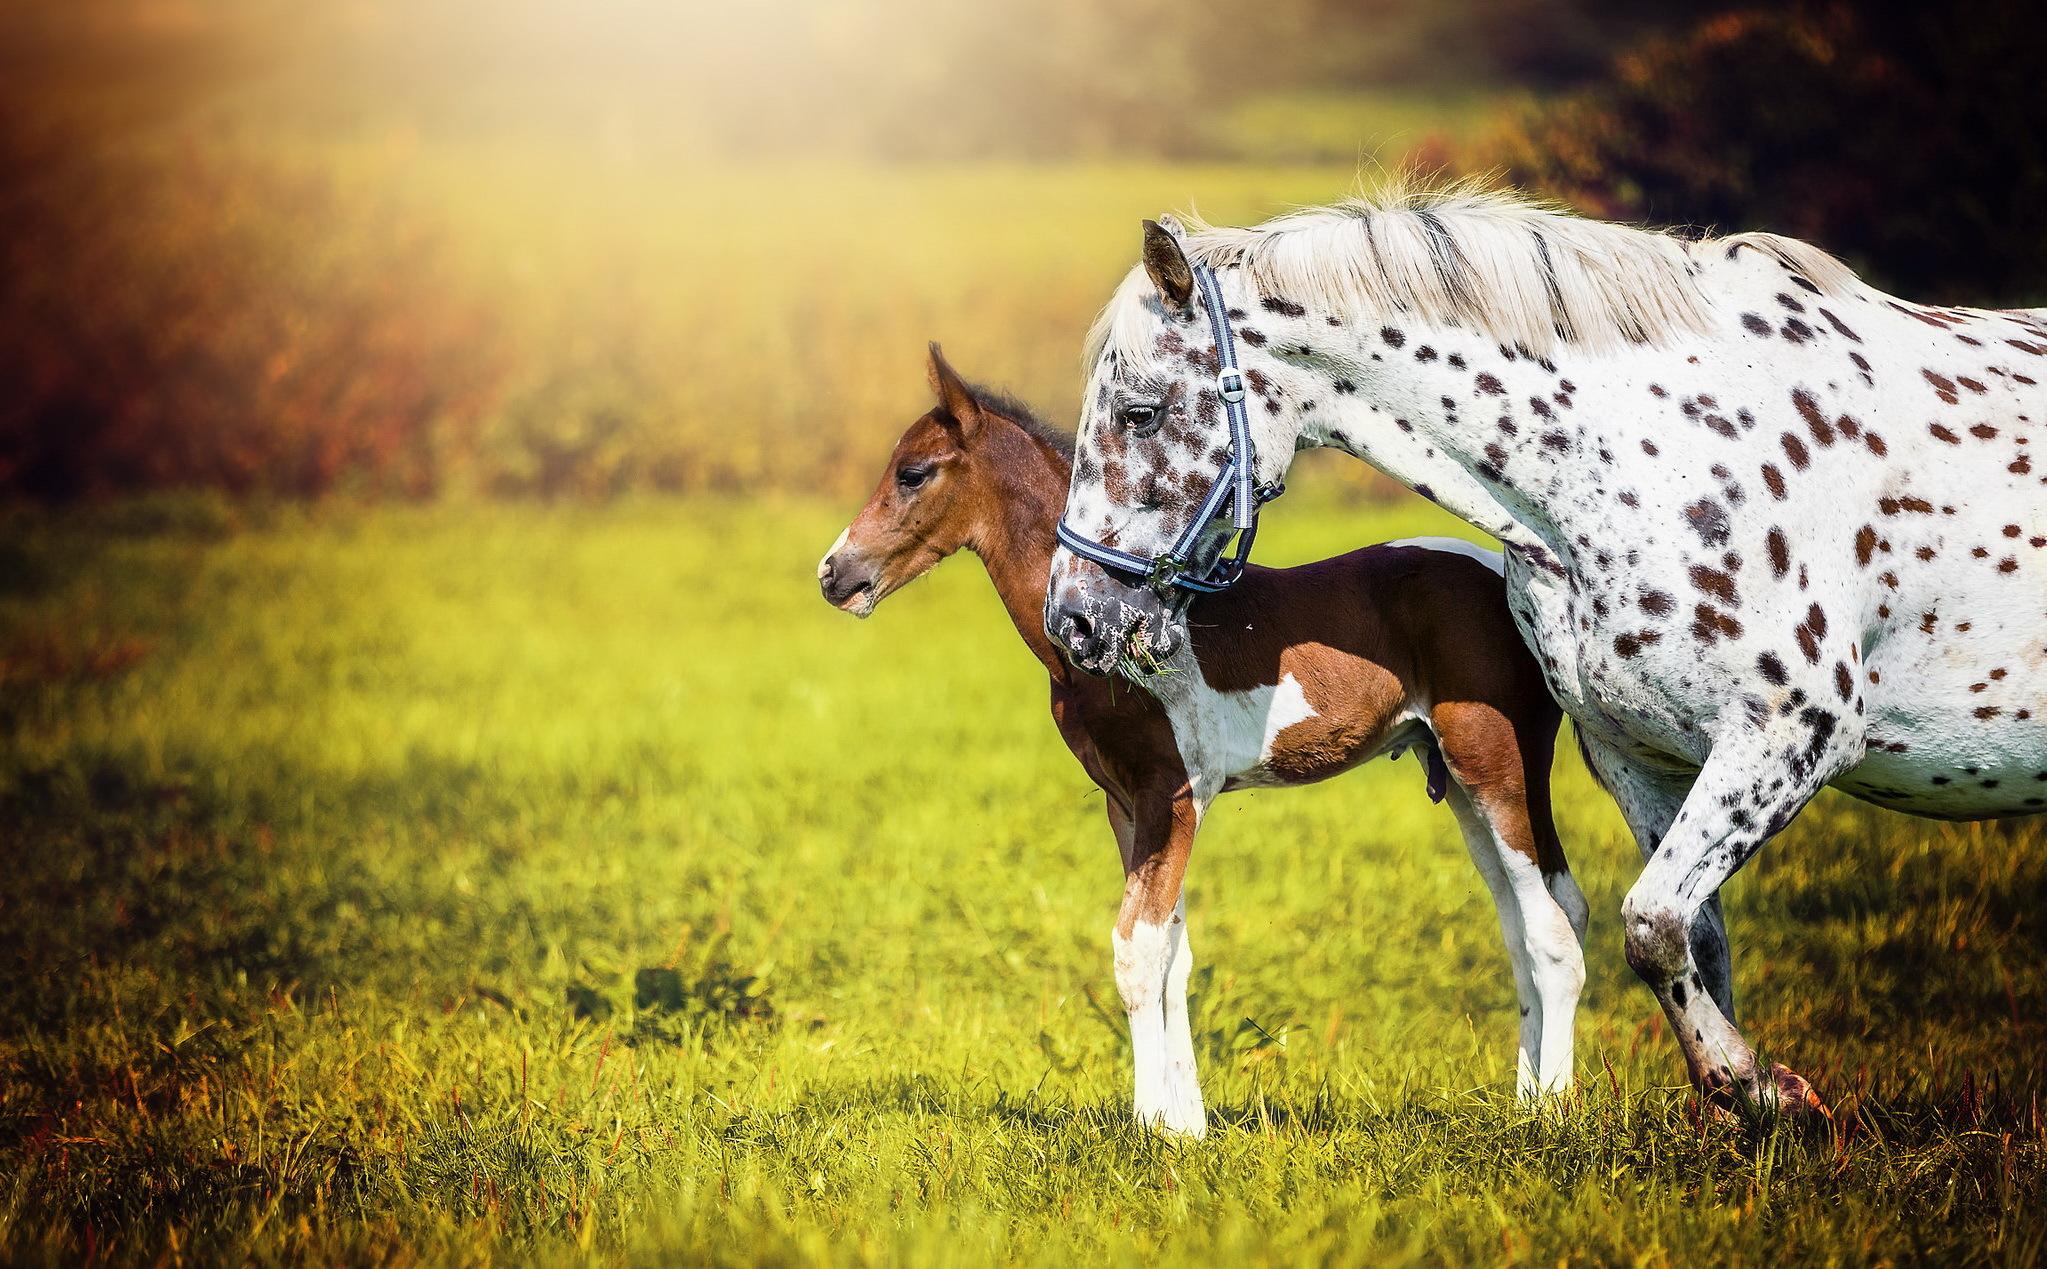 Baby Animal Foal Horse Wildlife 2047x1269